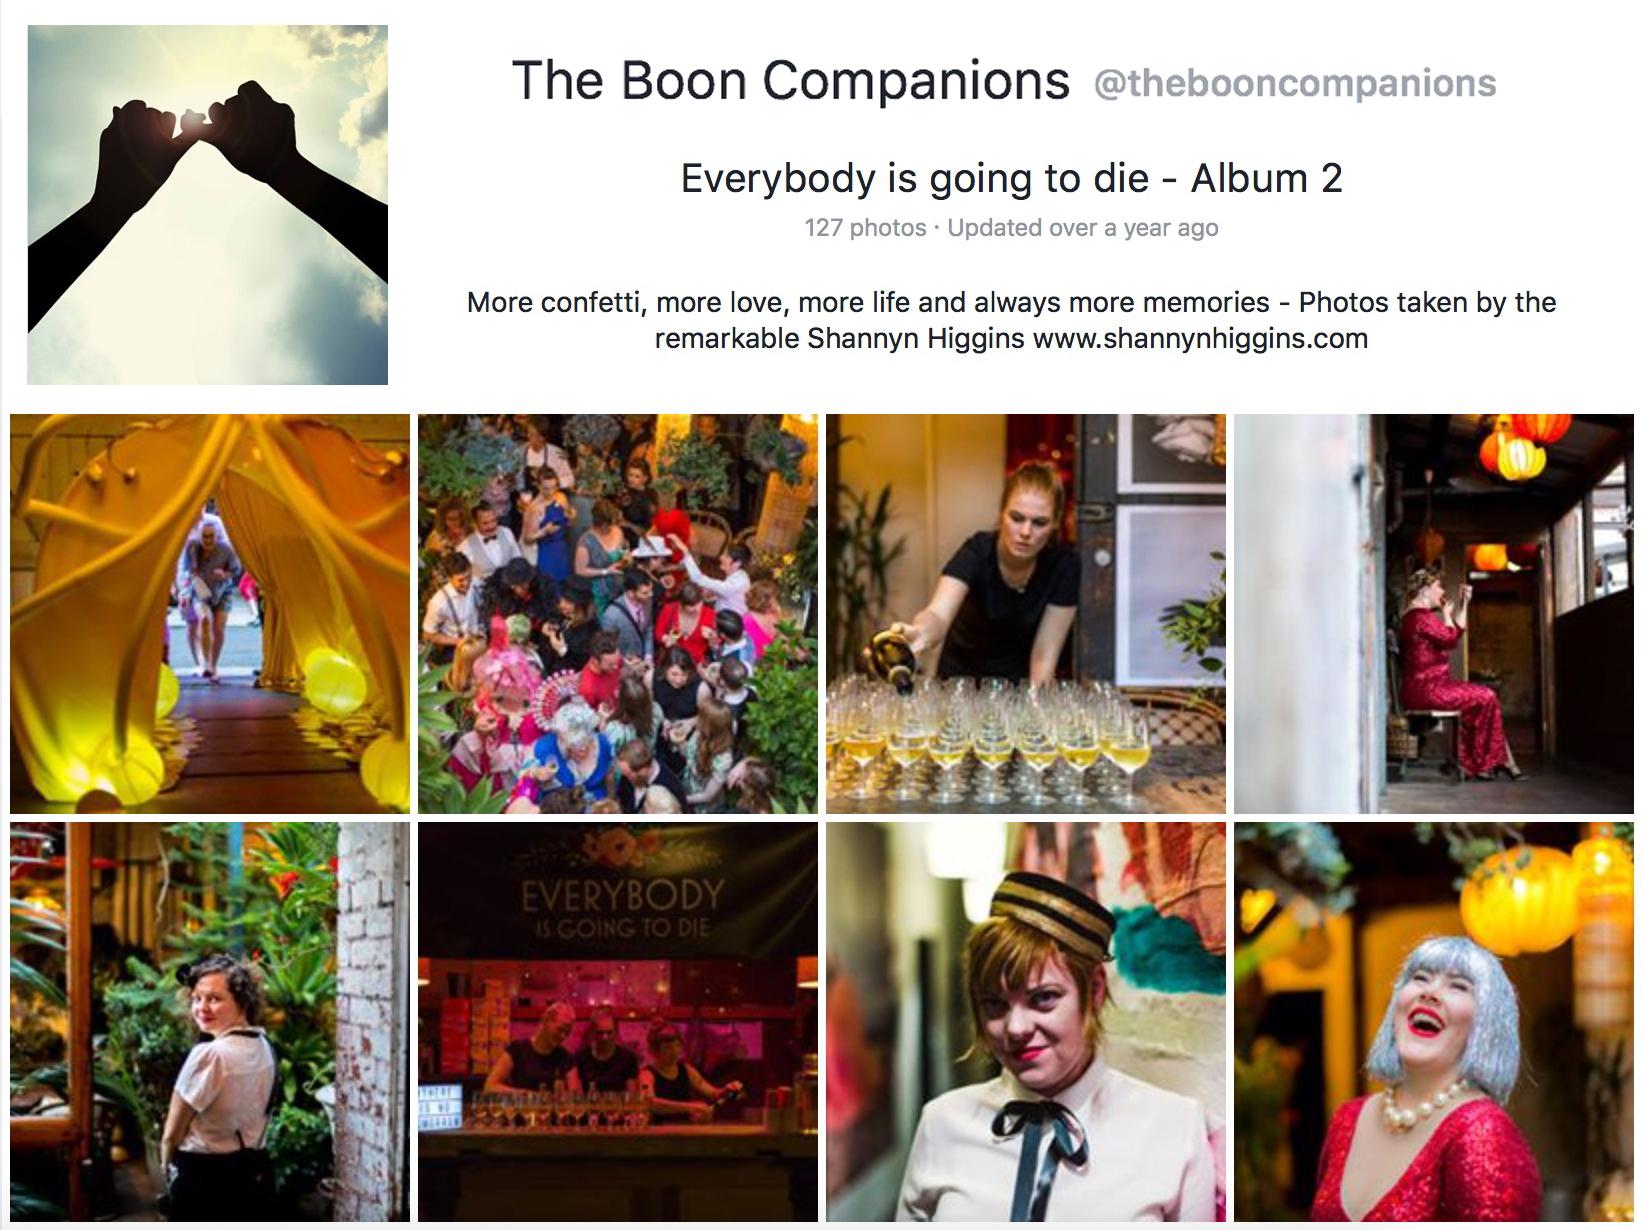 boons3 copy.jpg